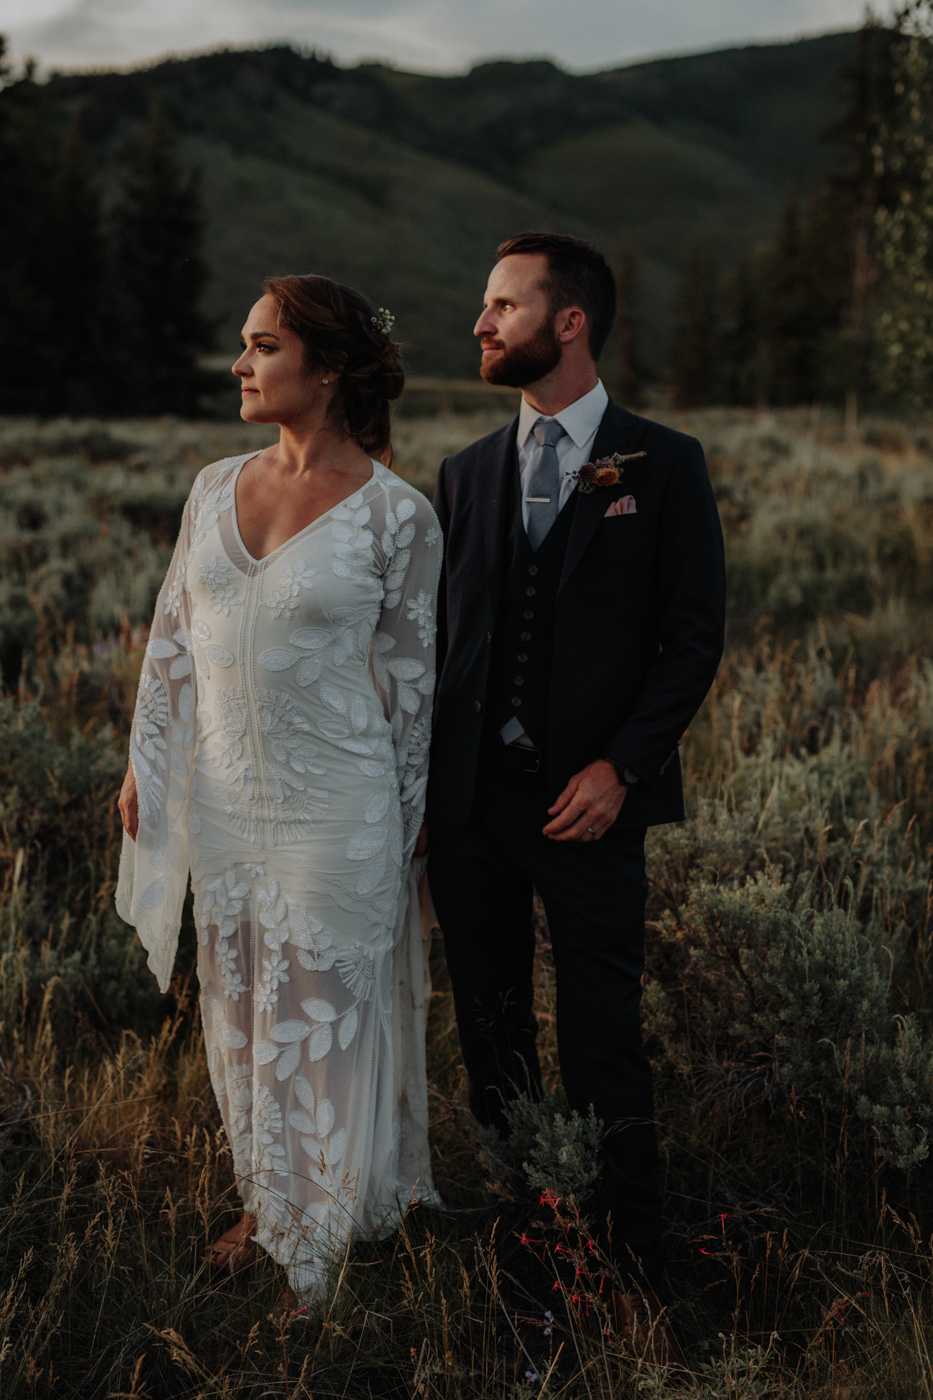 woods-walk-trail-crested-butte-colorado-wedding-135.jpg